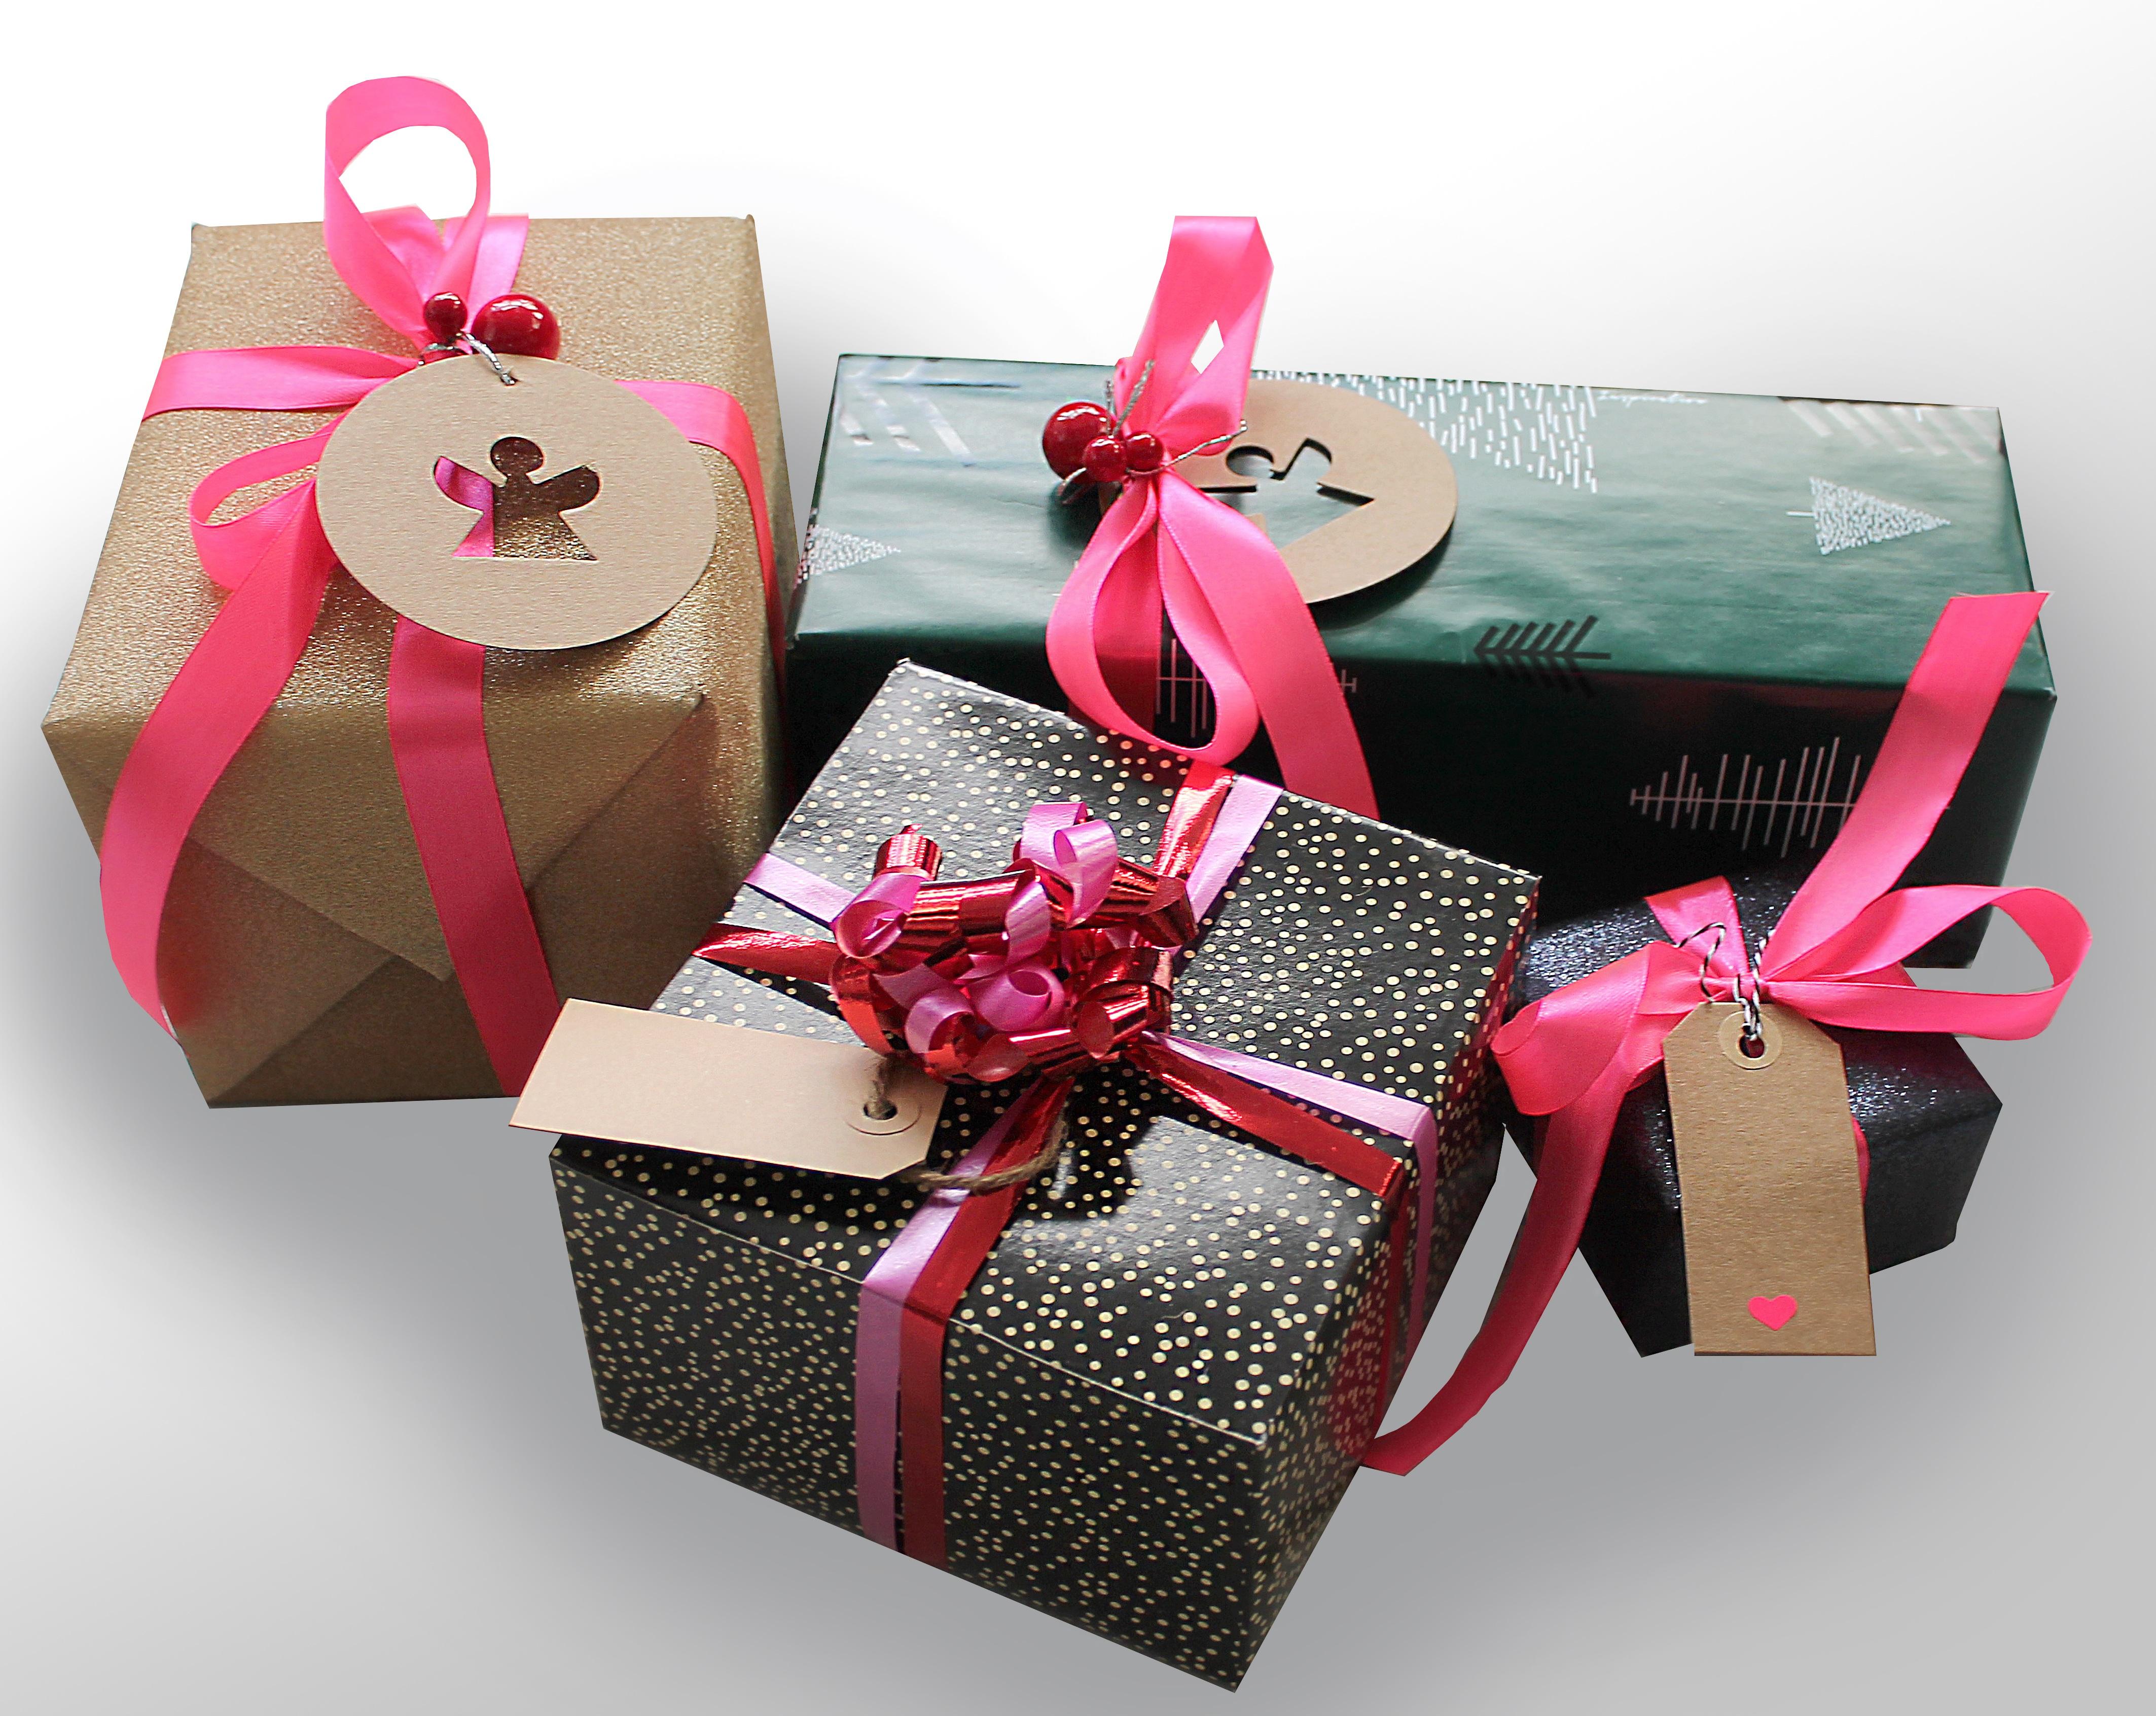 Kostenlose foto : Blütenblatt, Geschenk, Box, Korb, Rosa, Geschenke ...